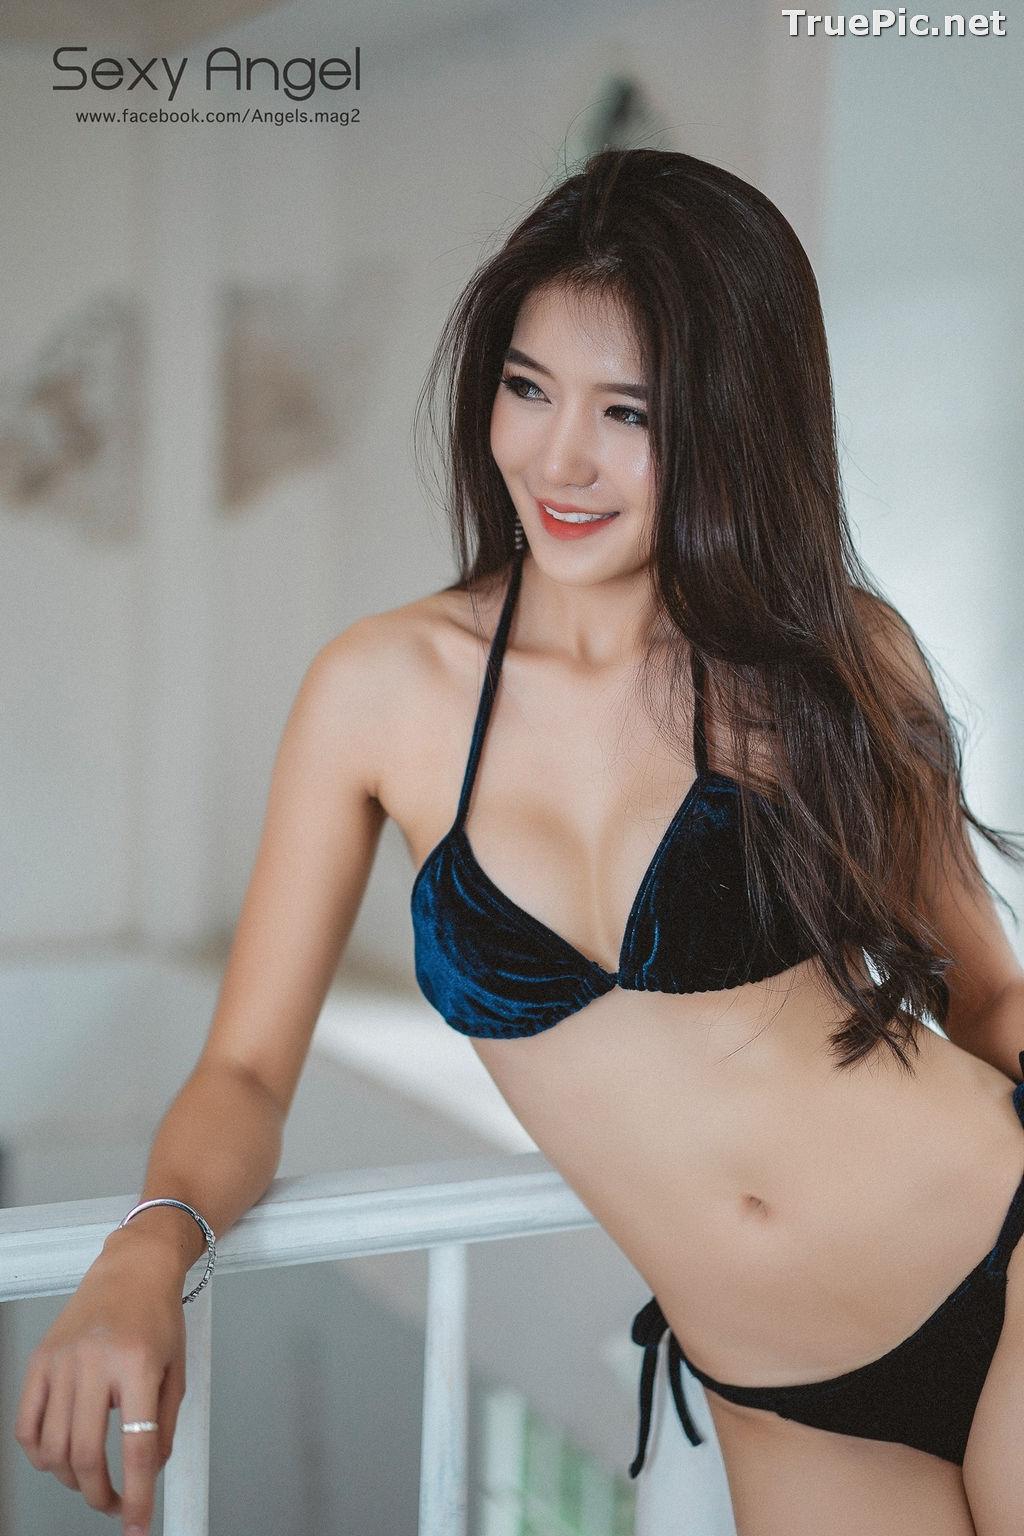 Image Thailand Model - Saruda Chalermsaen (EveAva) - Sexy Bikini Angel - TruePic.net - Picture-15